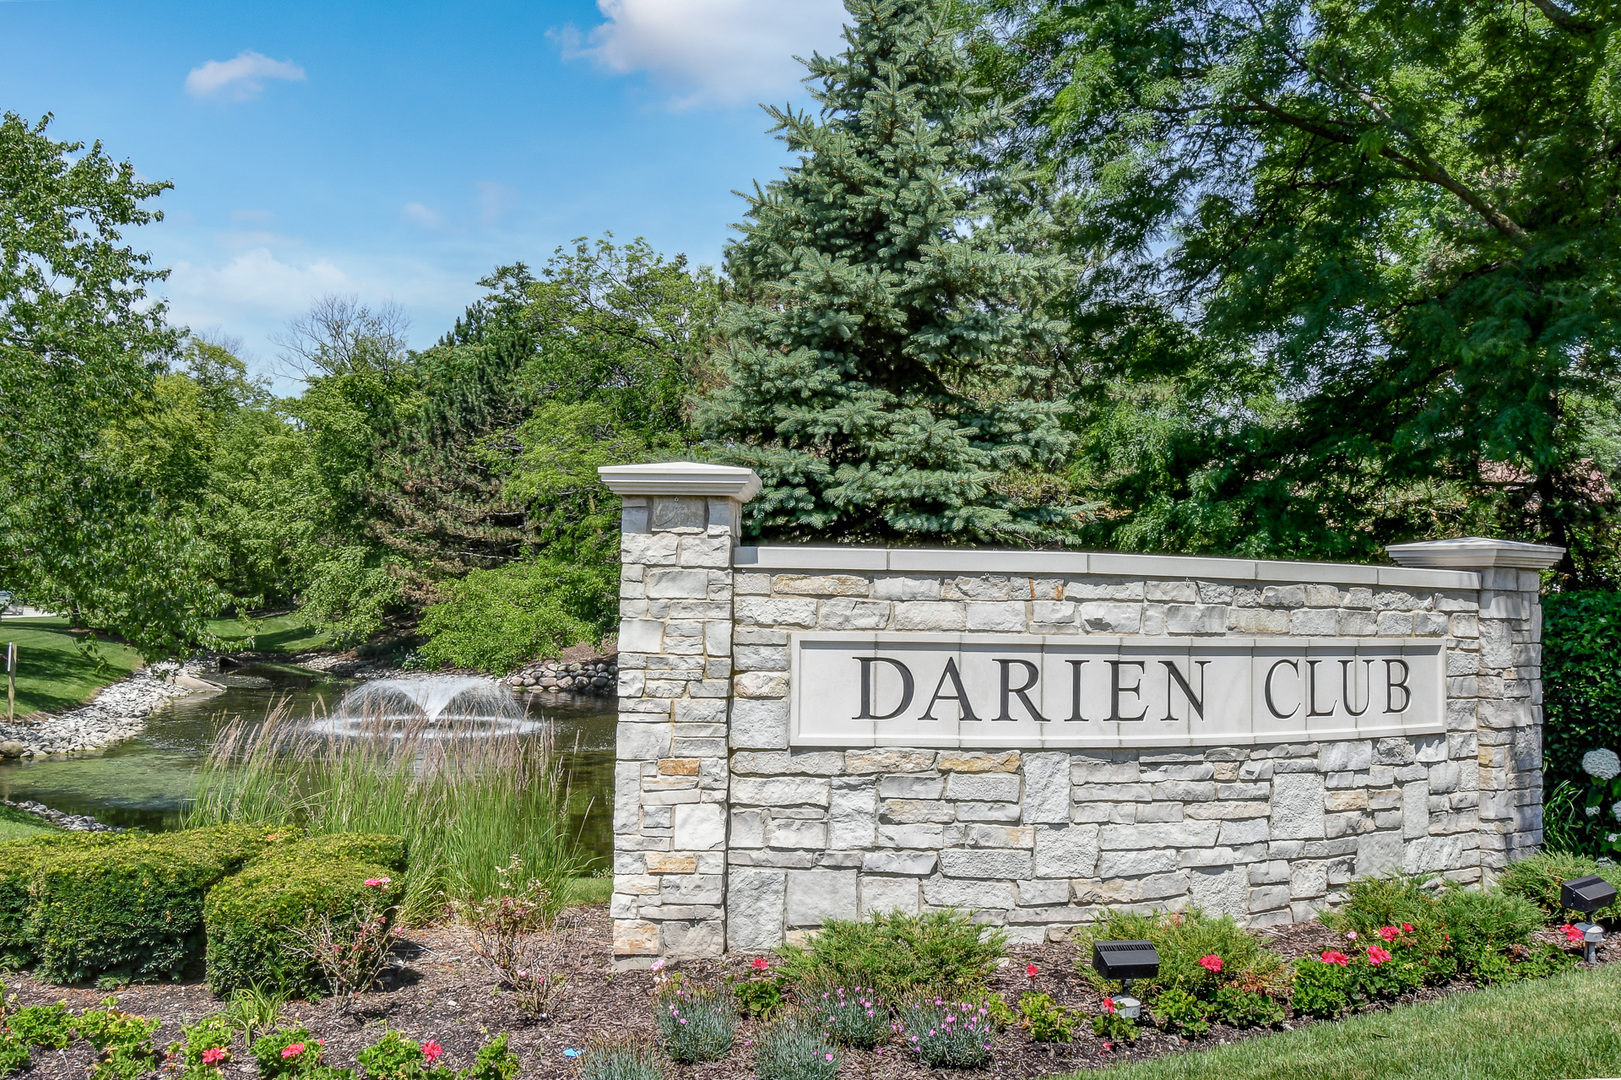 1617 Darien Club, Darien, Illinois, 60561